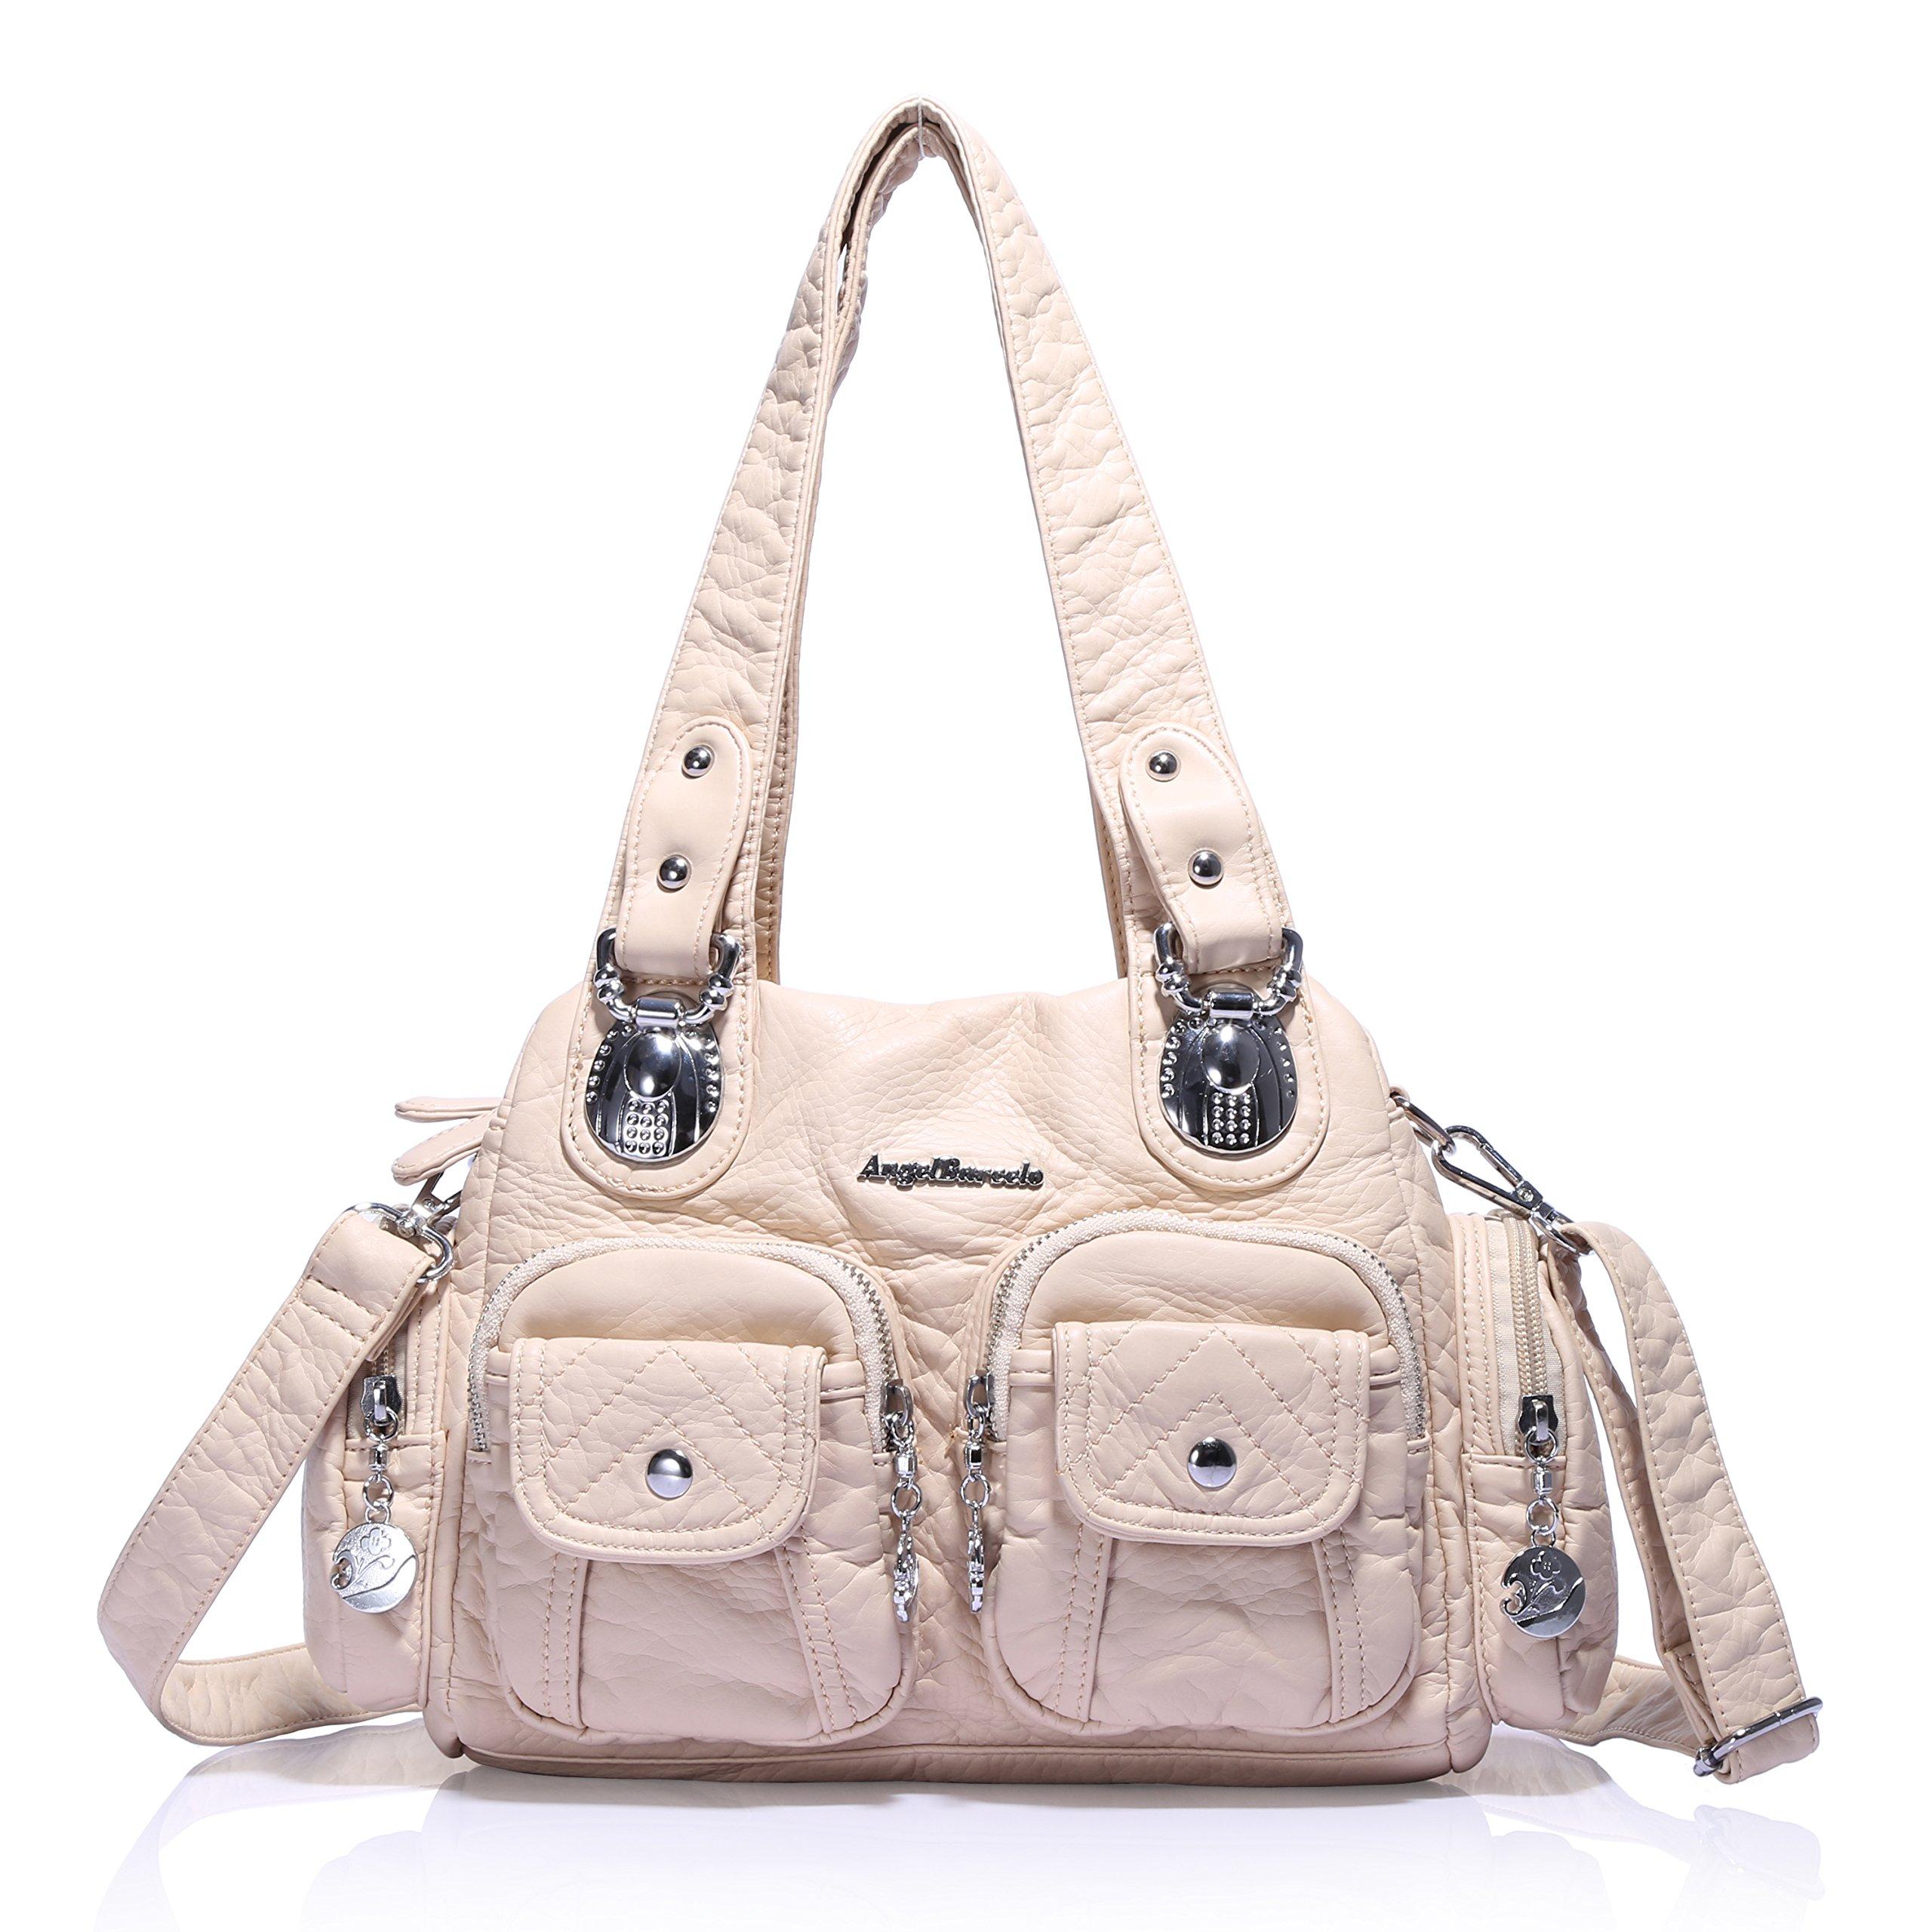 Angel Barcelo 3 Mini Handbags Women Purse PU Leather Top Zippers Multi Pockets Shoulder Bags … (Beige)